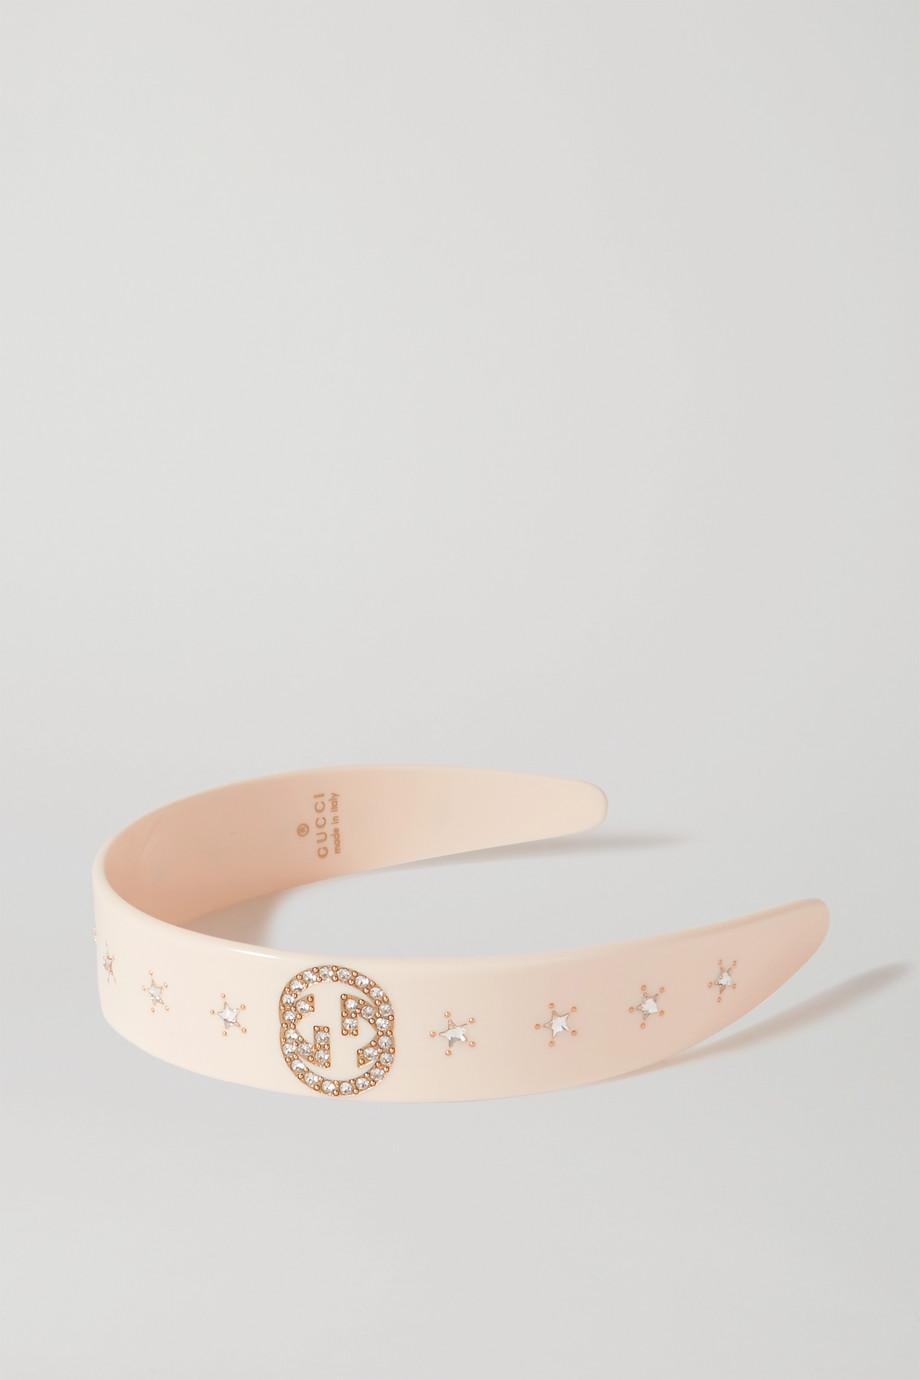 Gucci Crystal-embellished resin headband